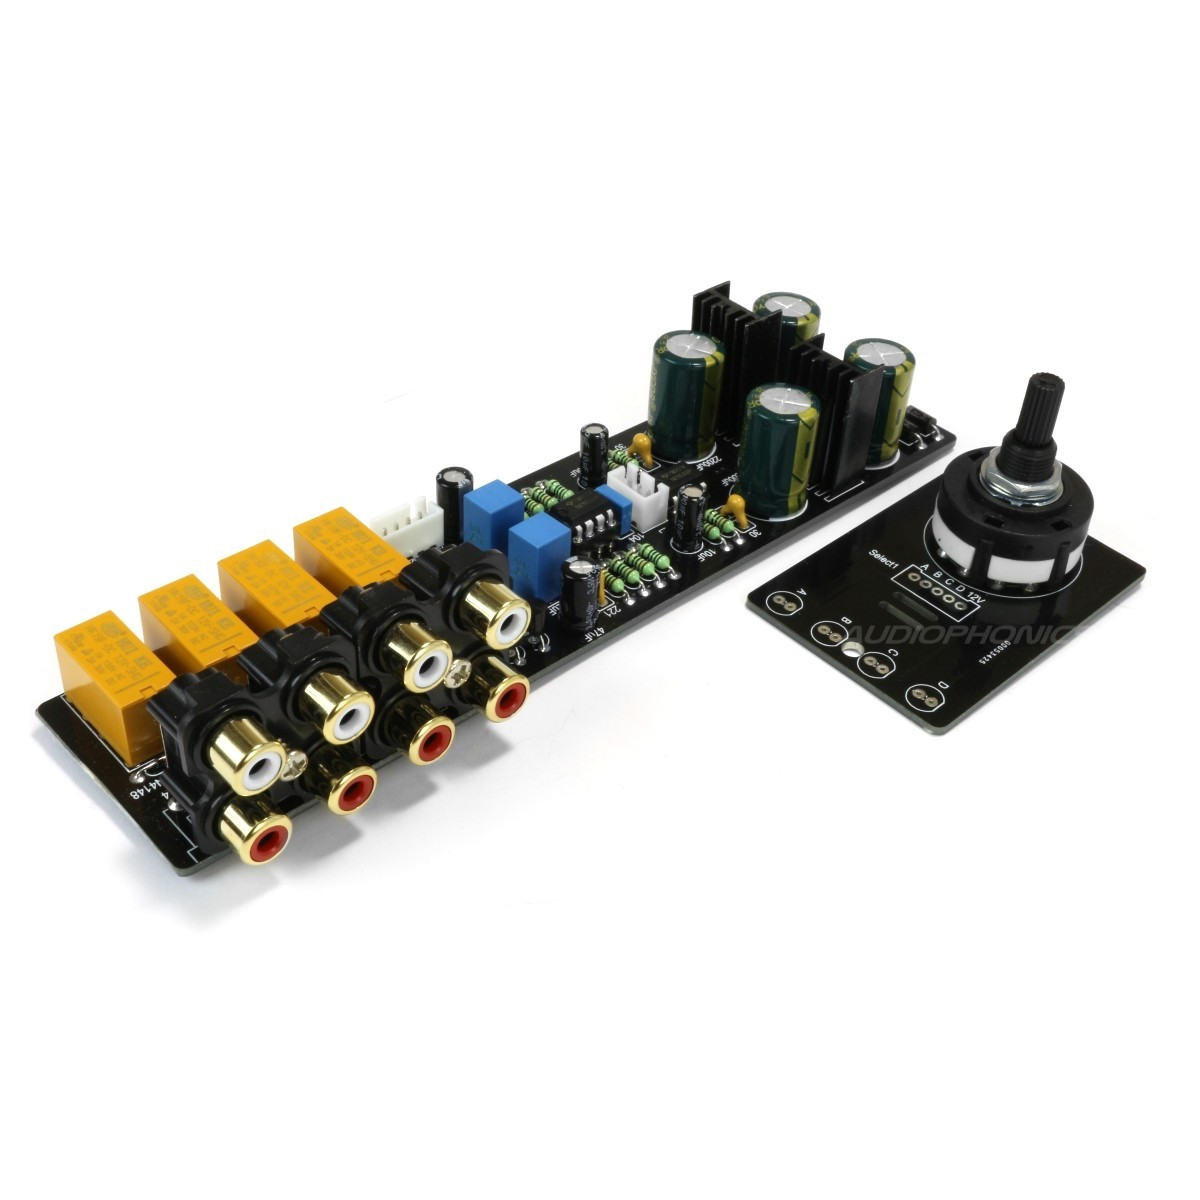 Module buffer source selection 2x NE5532 4 input RCA